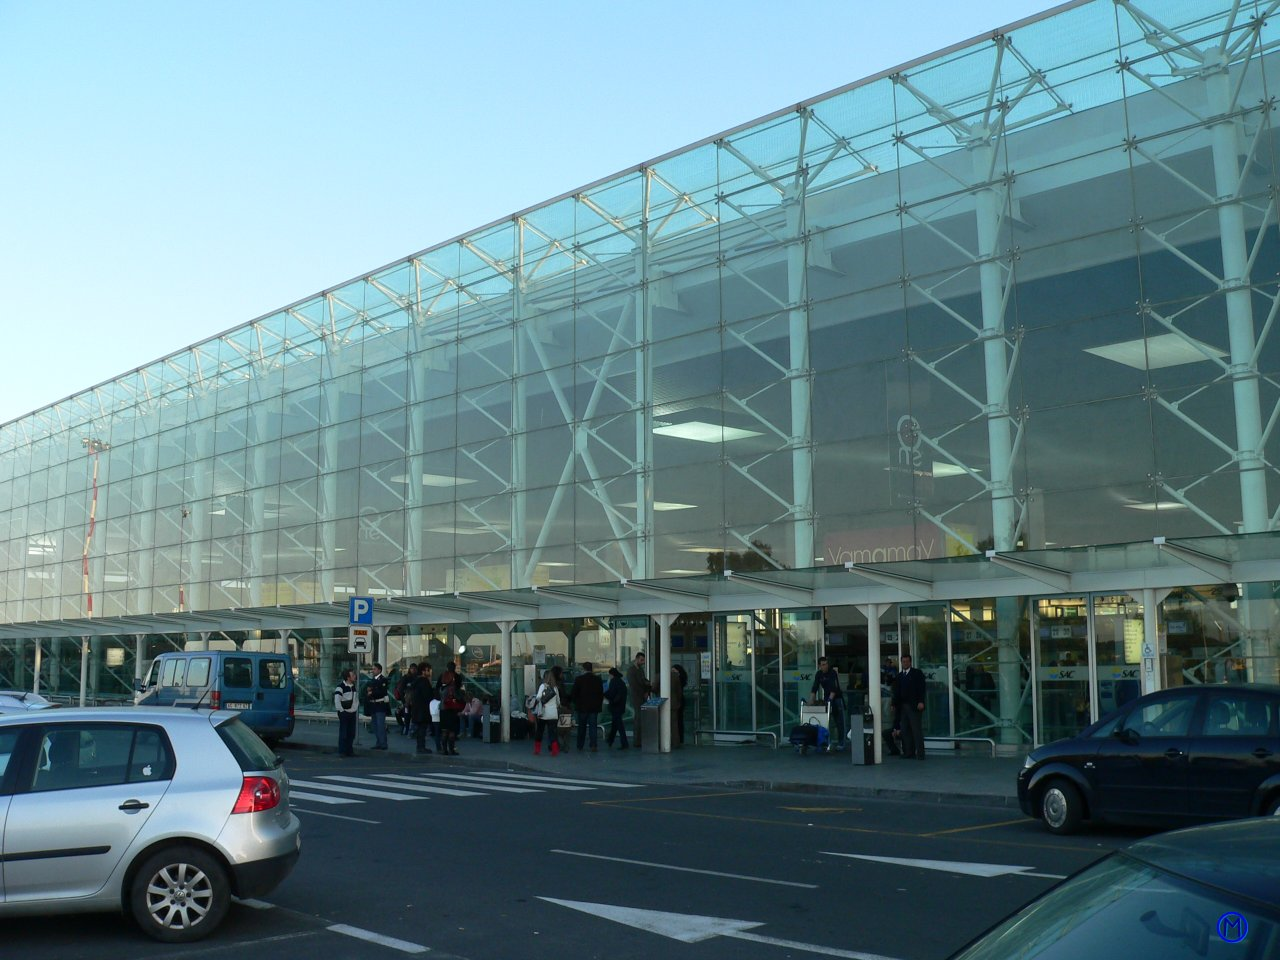 Catania Flughafen Ankunft